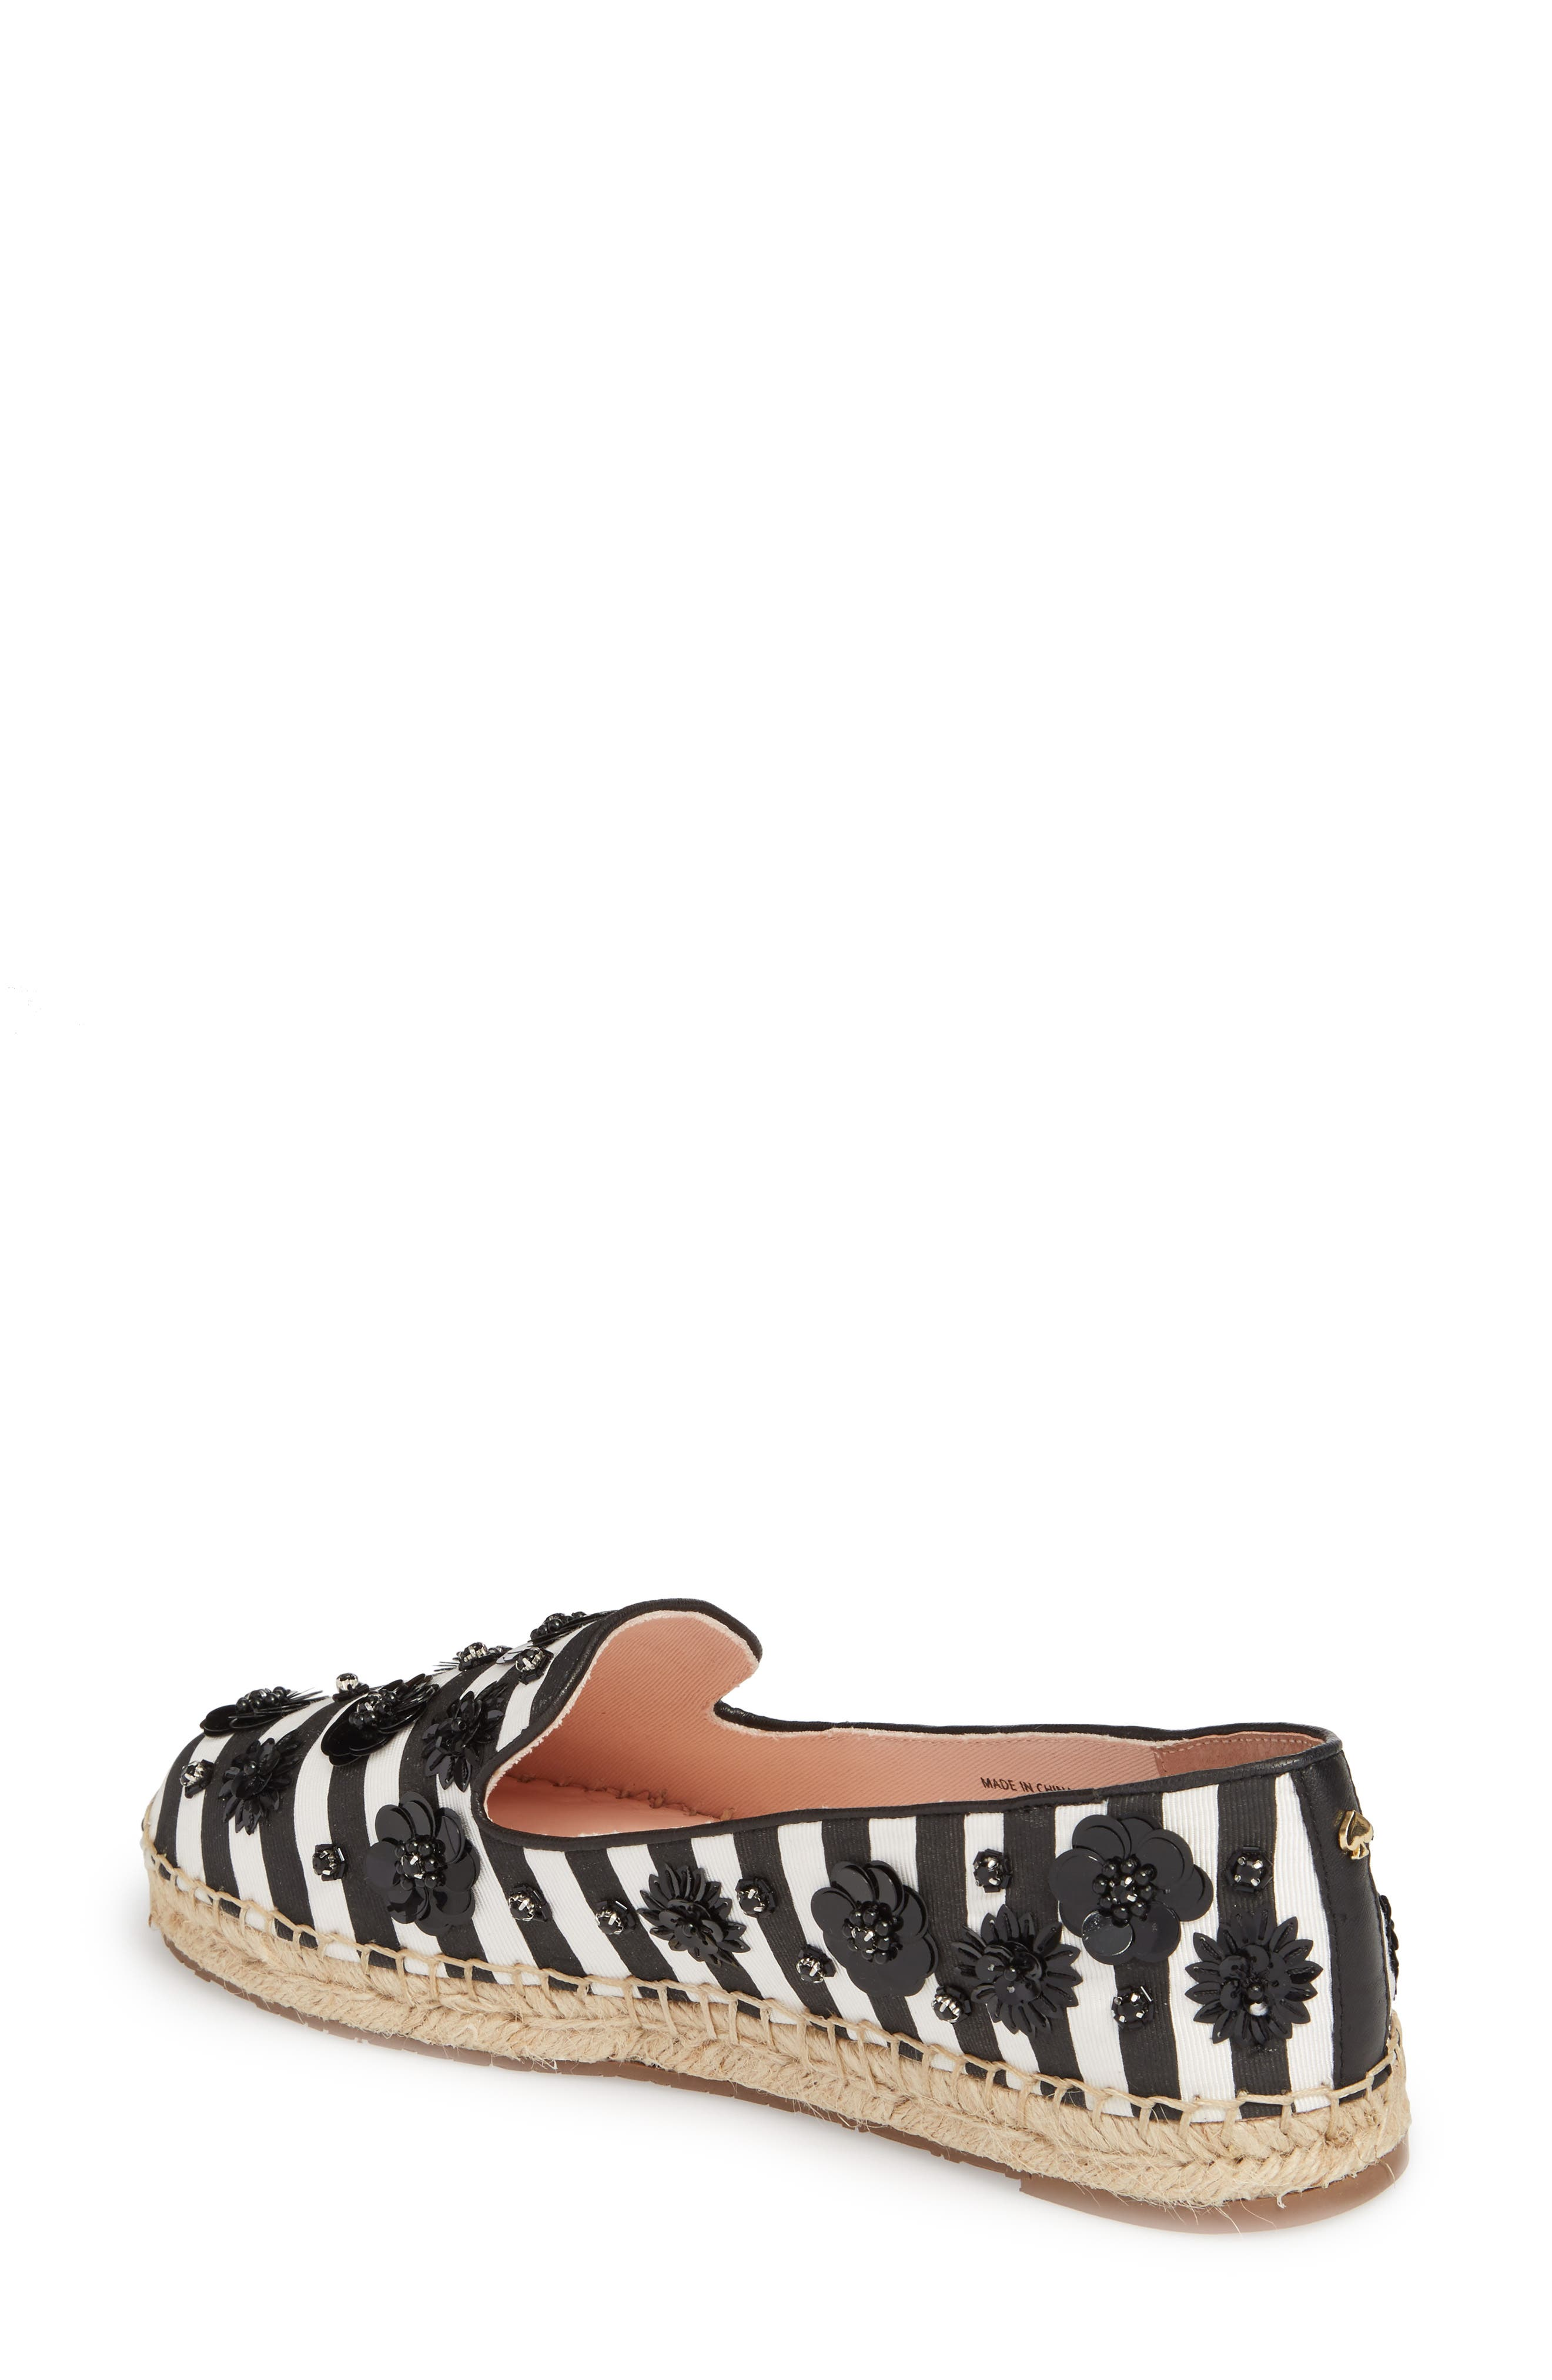 leigh embellished espadrille flat,                             Alternate thumbnail 2, color,                             Black/ White Striped